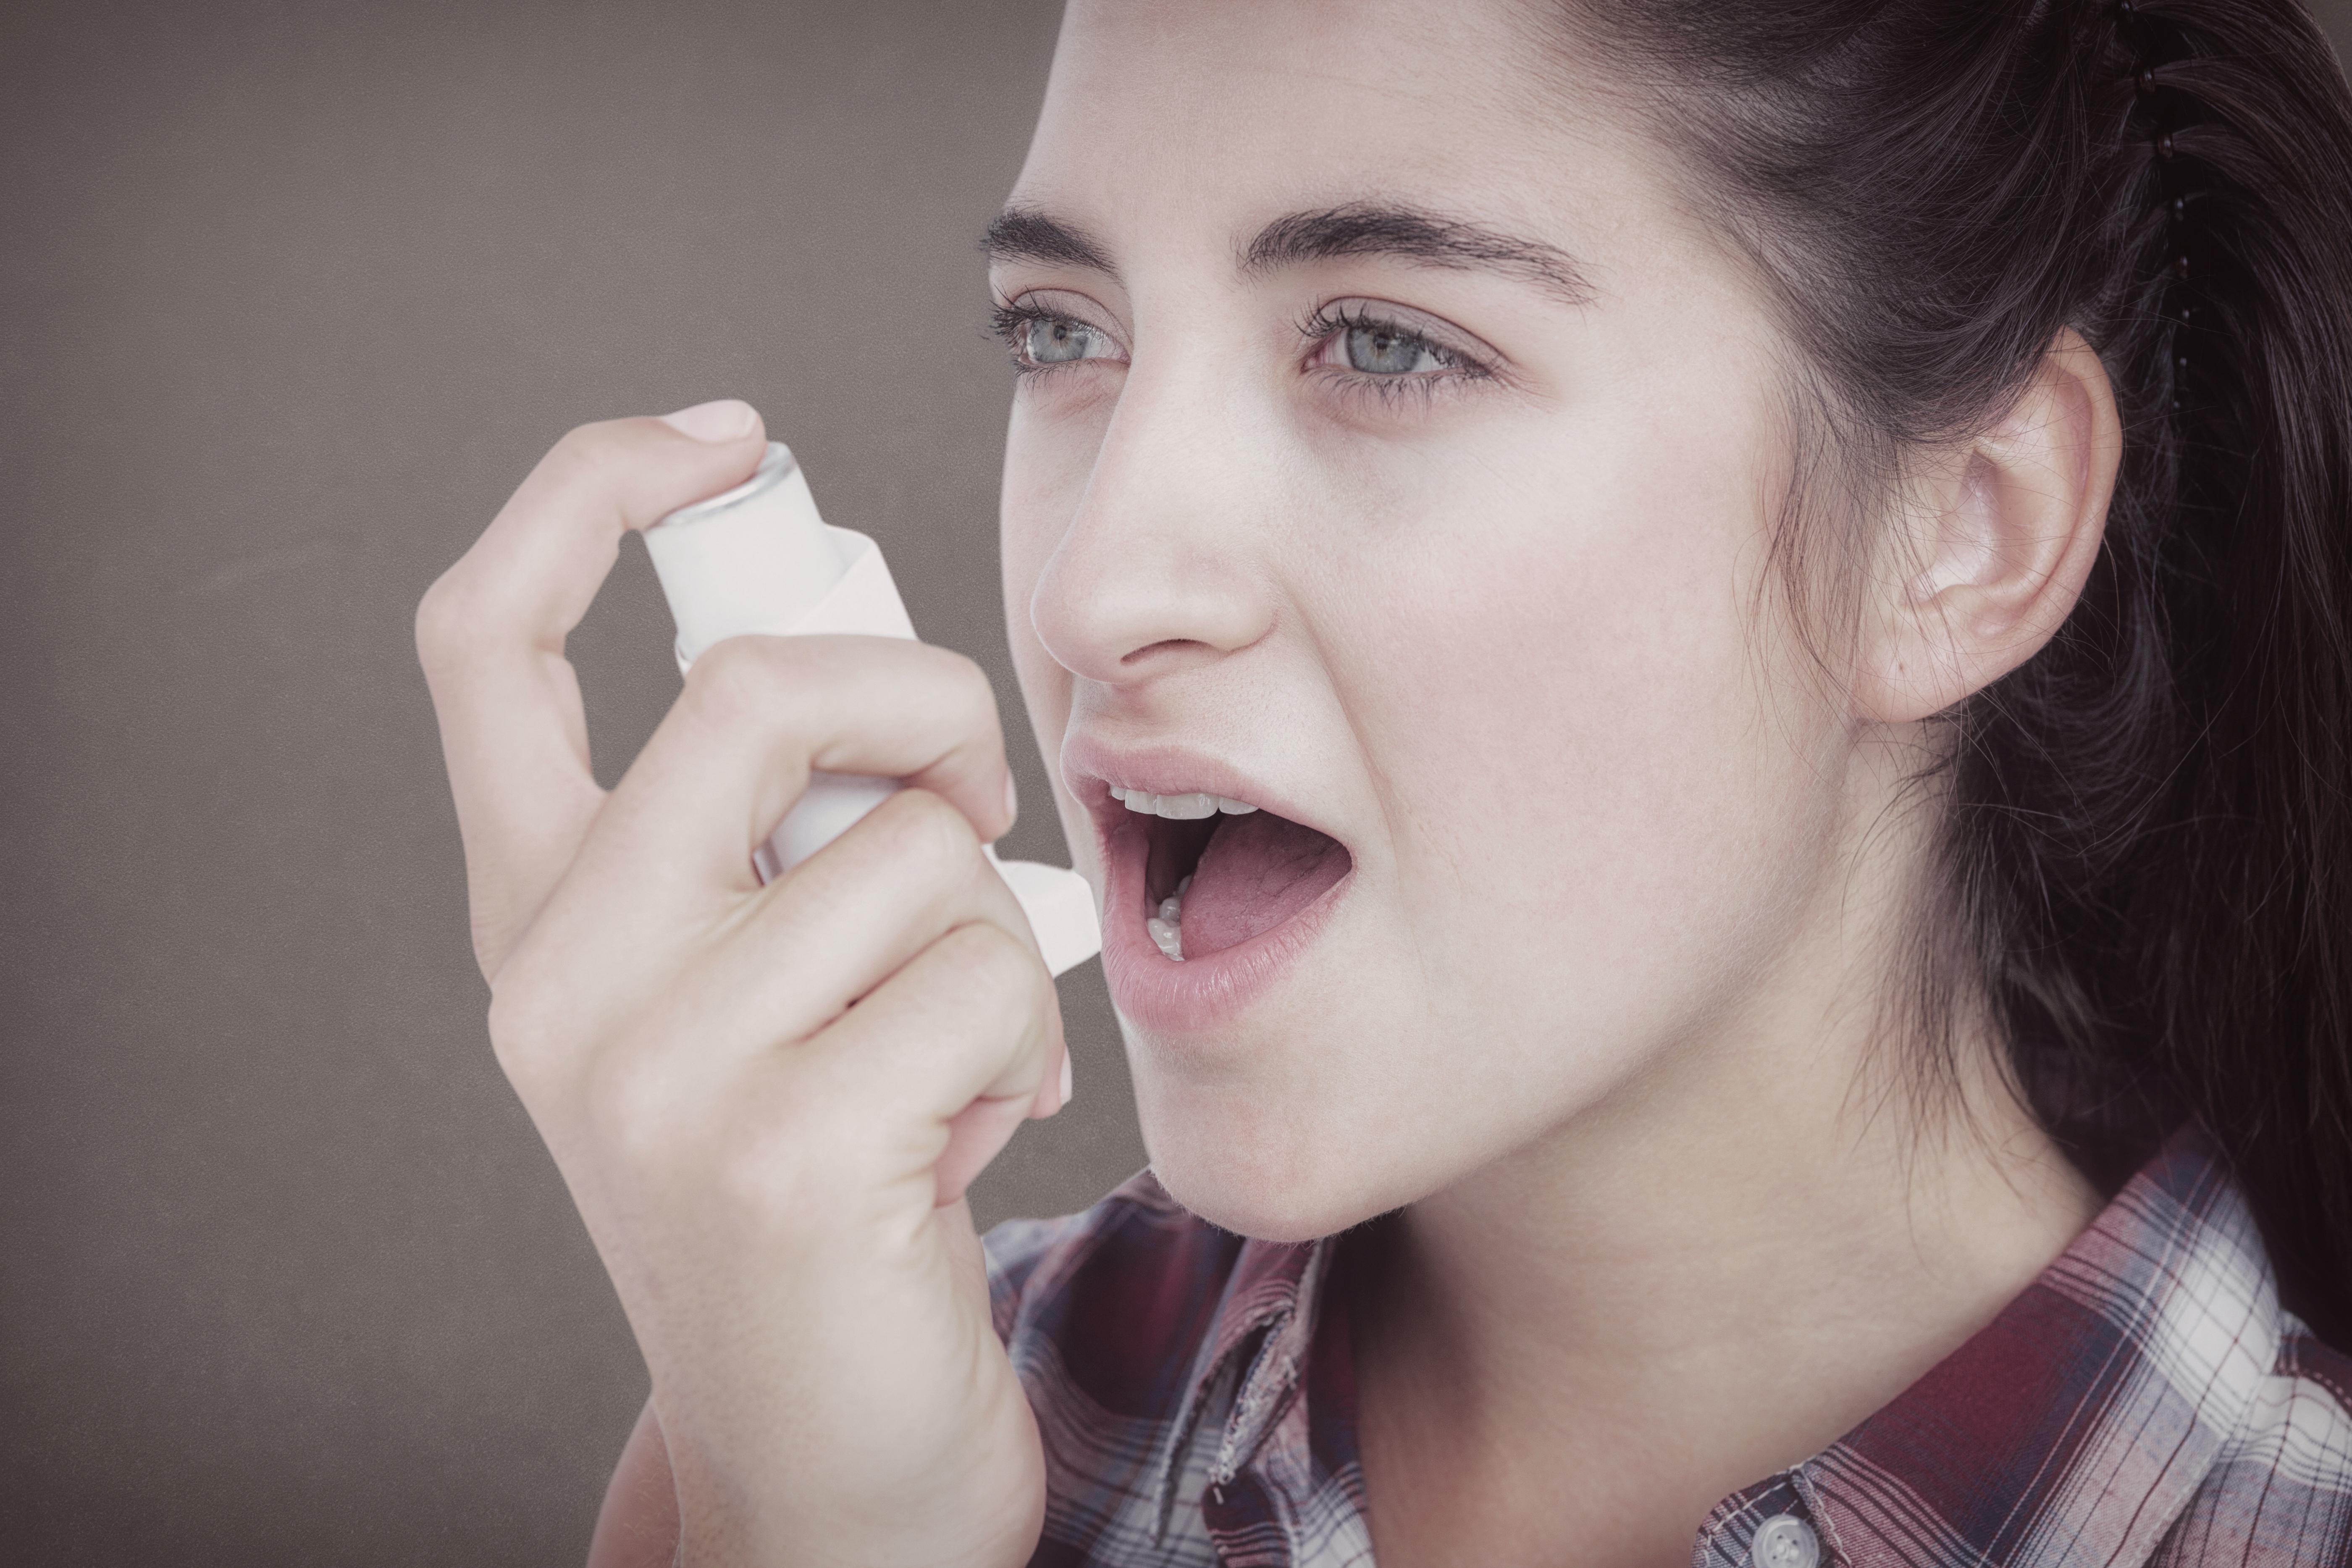 Astma vanligare bland låginkomsttagare